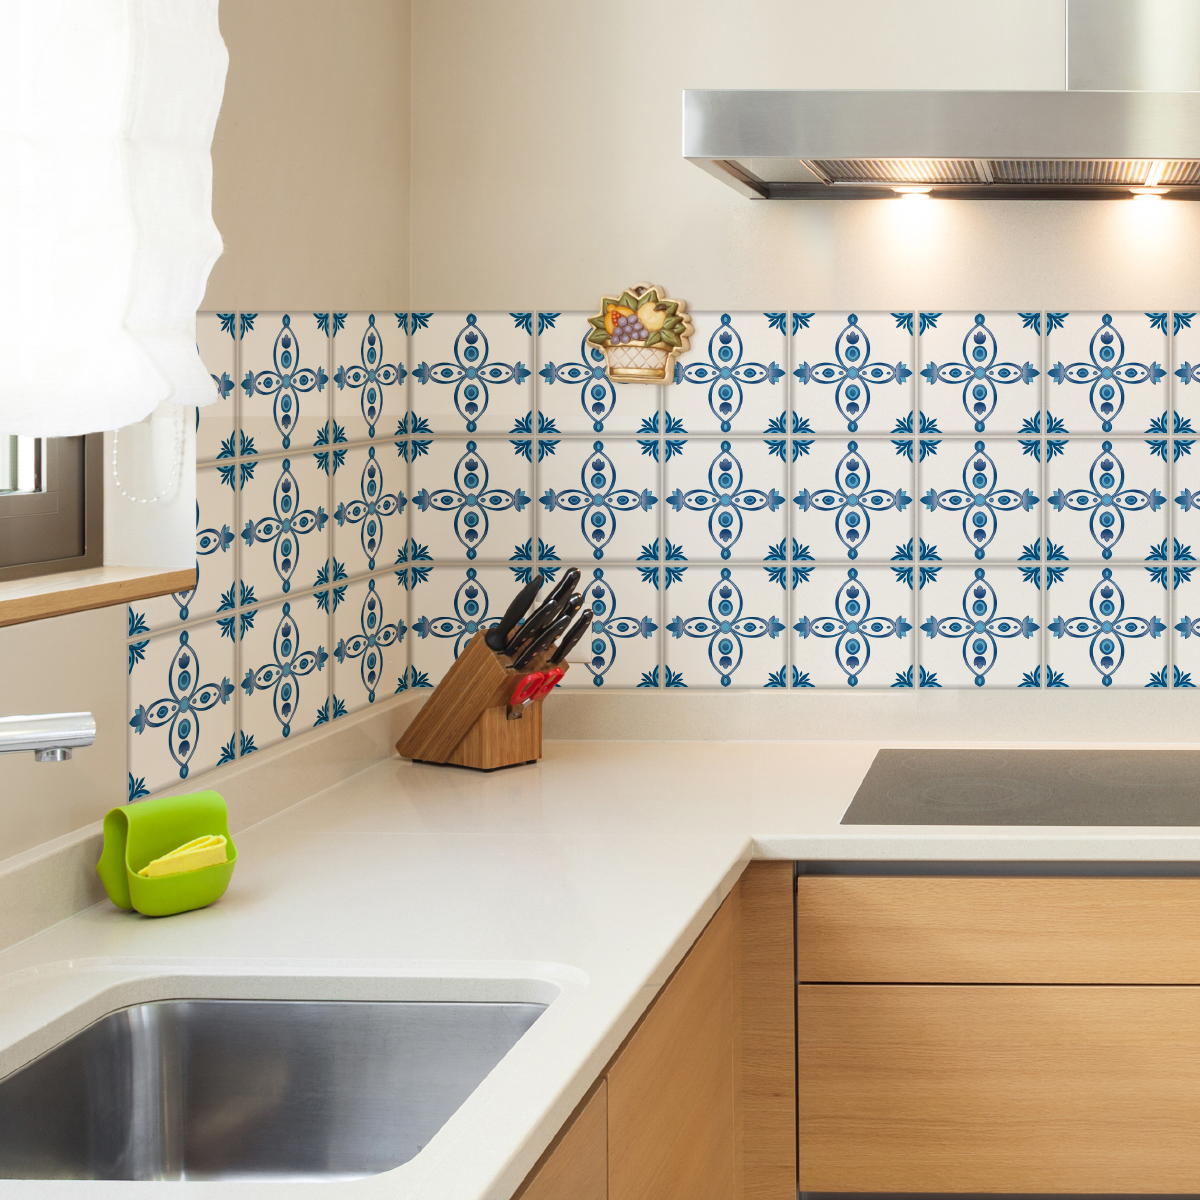 9 stickers carrelages delft almere cuisine carrelages ambiance sticker. Black Bedroom Furniture Sets. Home Design Ideas